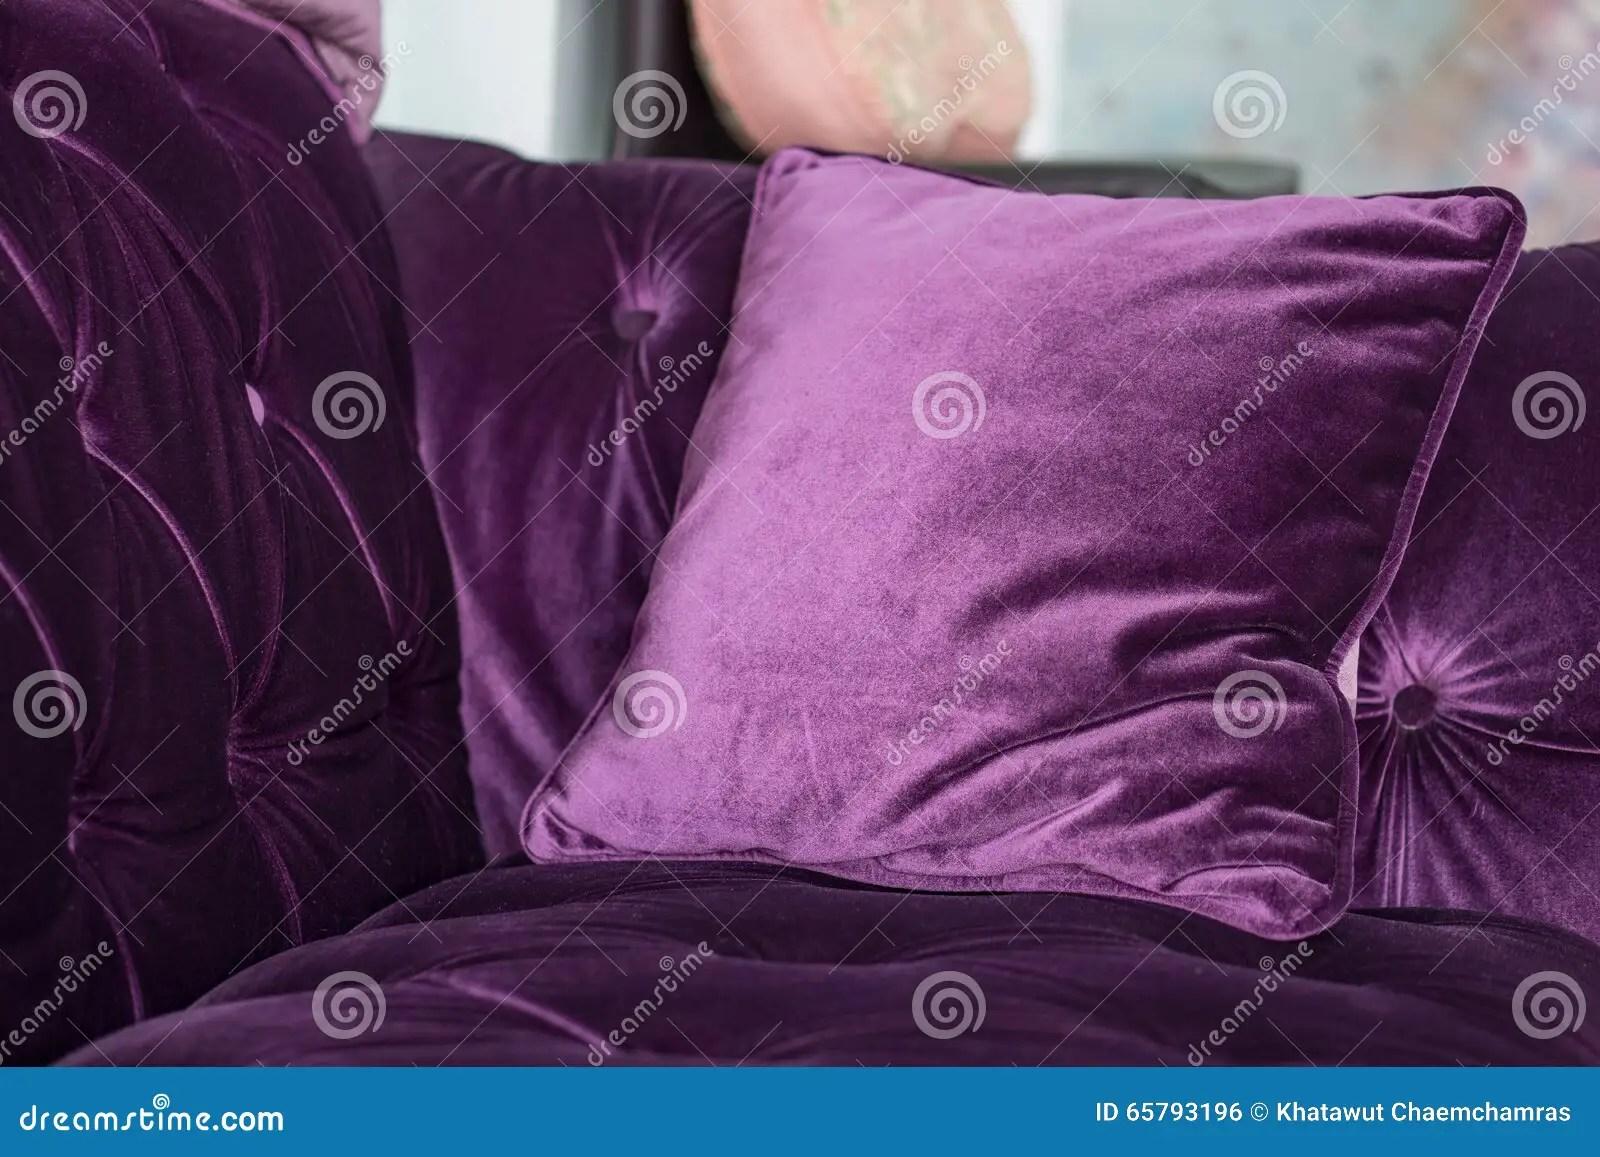 purple velvet pillows on the sofa stock photo image of sofa interior 65793196